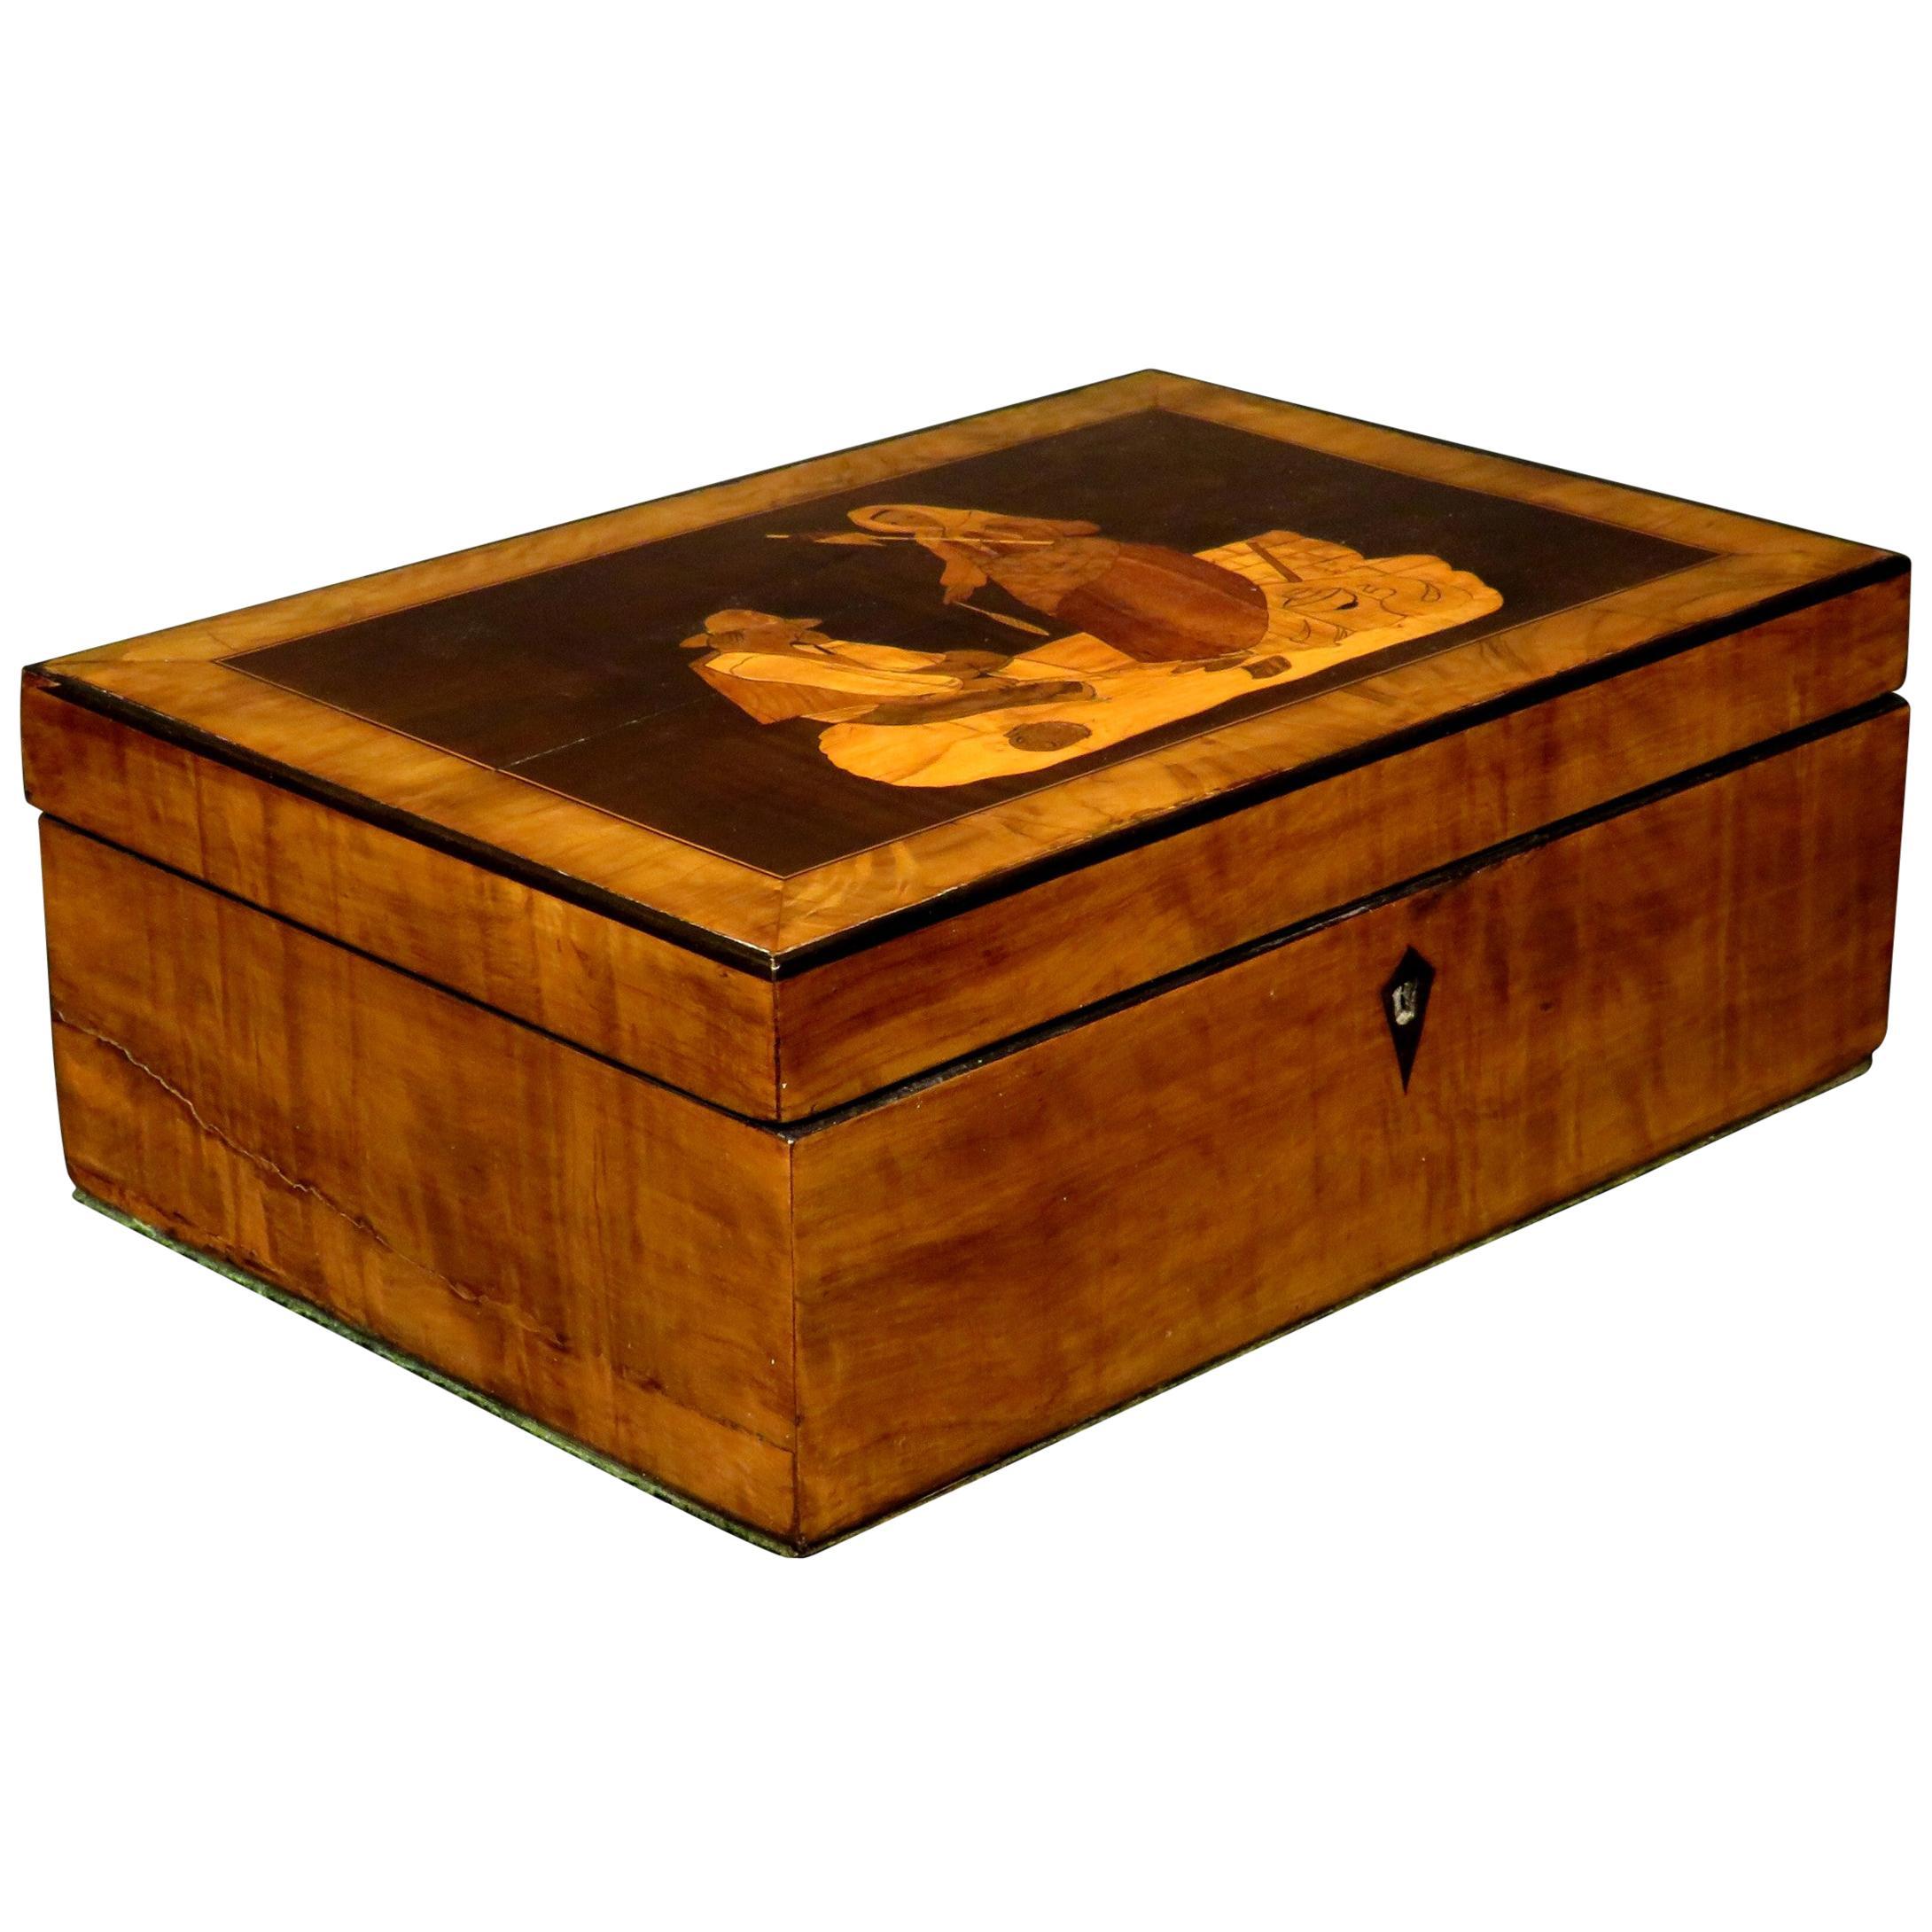 19th Century Sorrento Marquetry Jewellery Box / Trinket Box, Italy Circa 1880